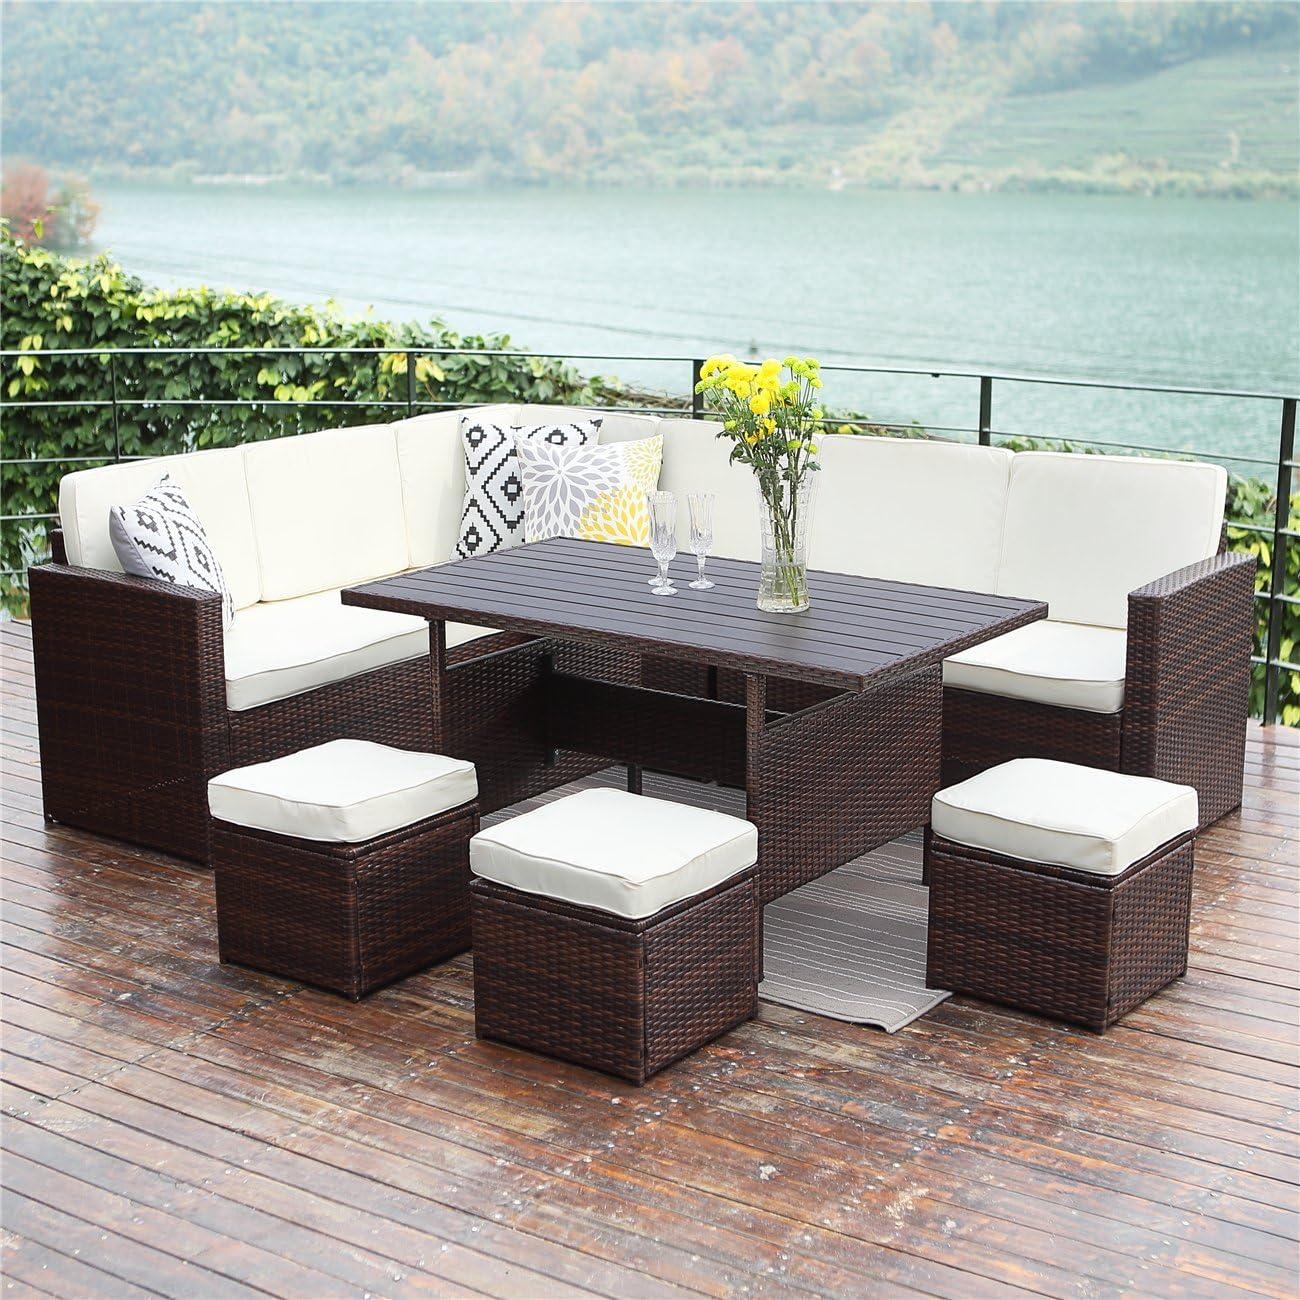 where can i find outdoor patio furniture 13 17 hus noorderpad de u2022 rh 13 17 hus noorderpad de